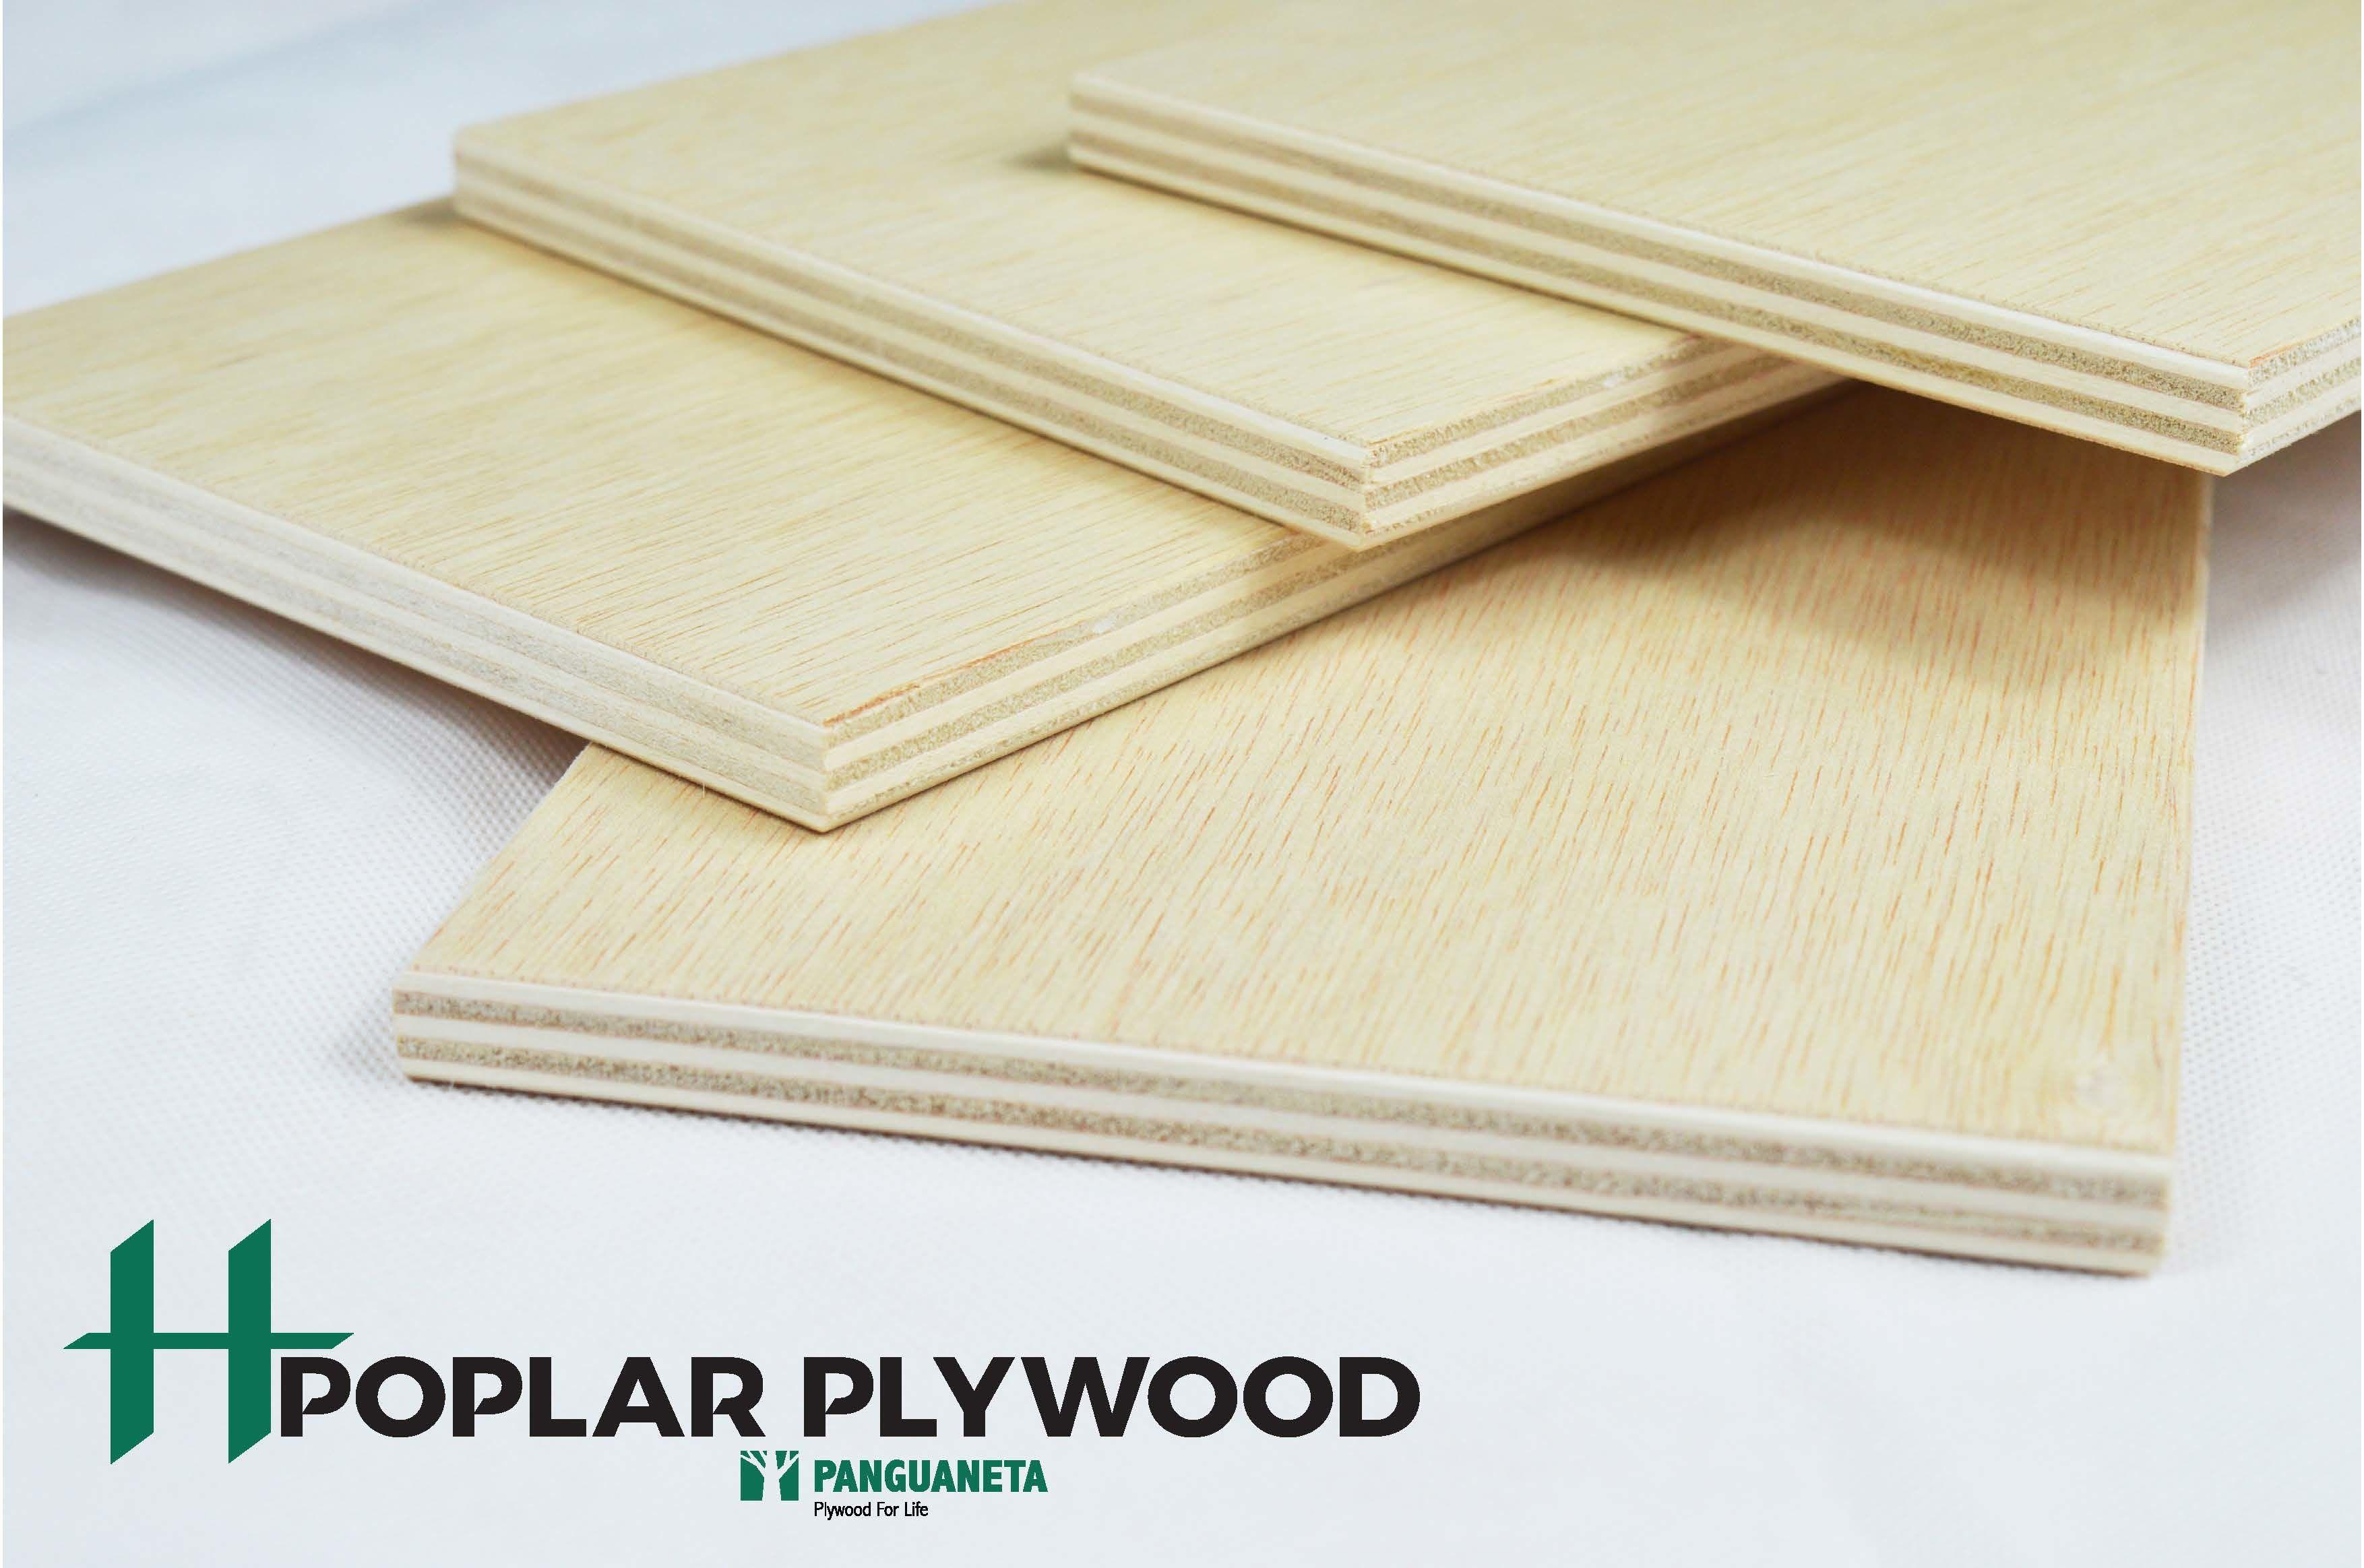 Product: Poplar Plywood